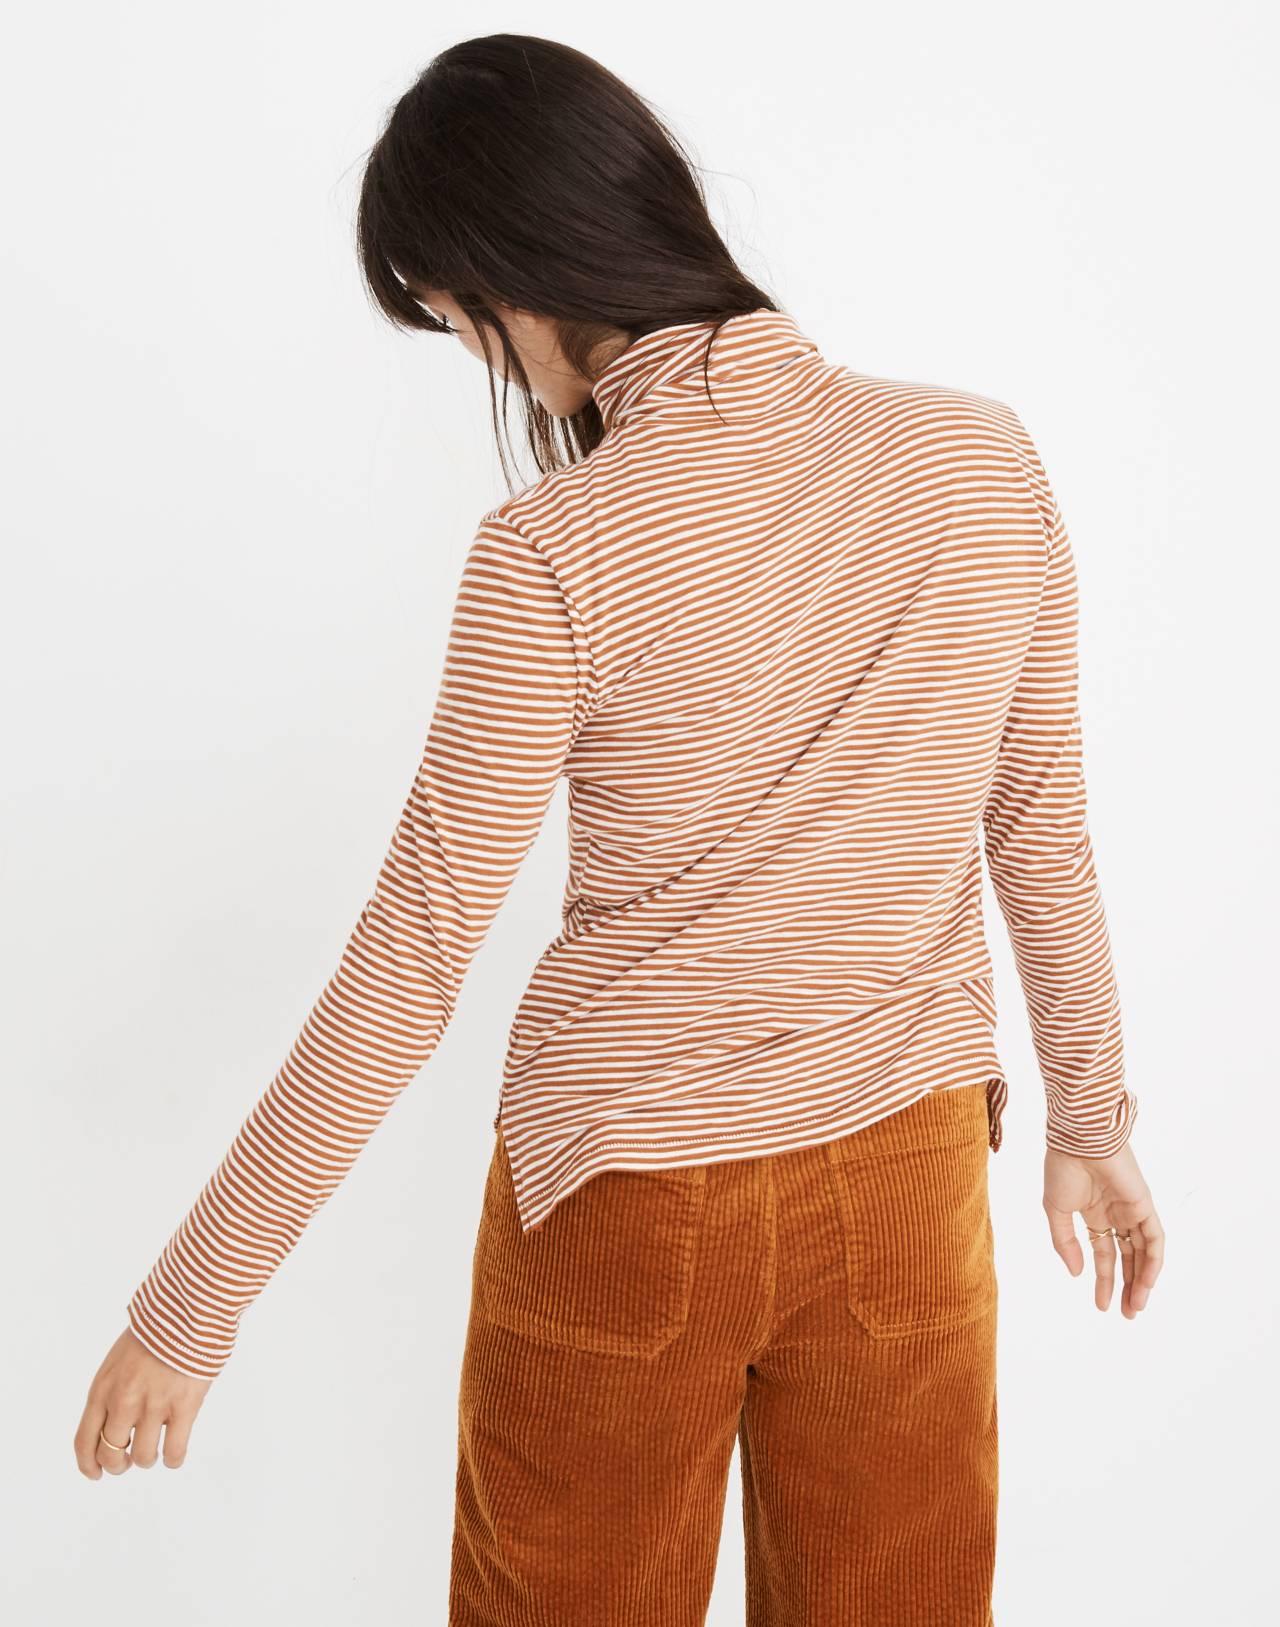 Whisper Cotton Turtleneck in Daniela Stripe in warm nutmeg image 3